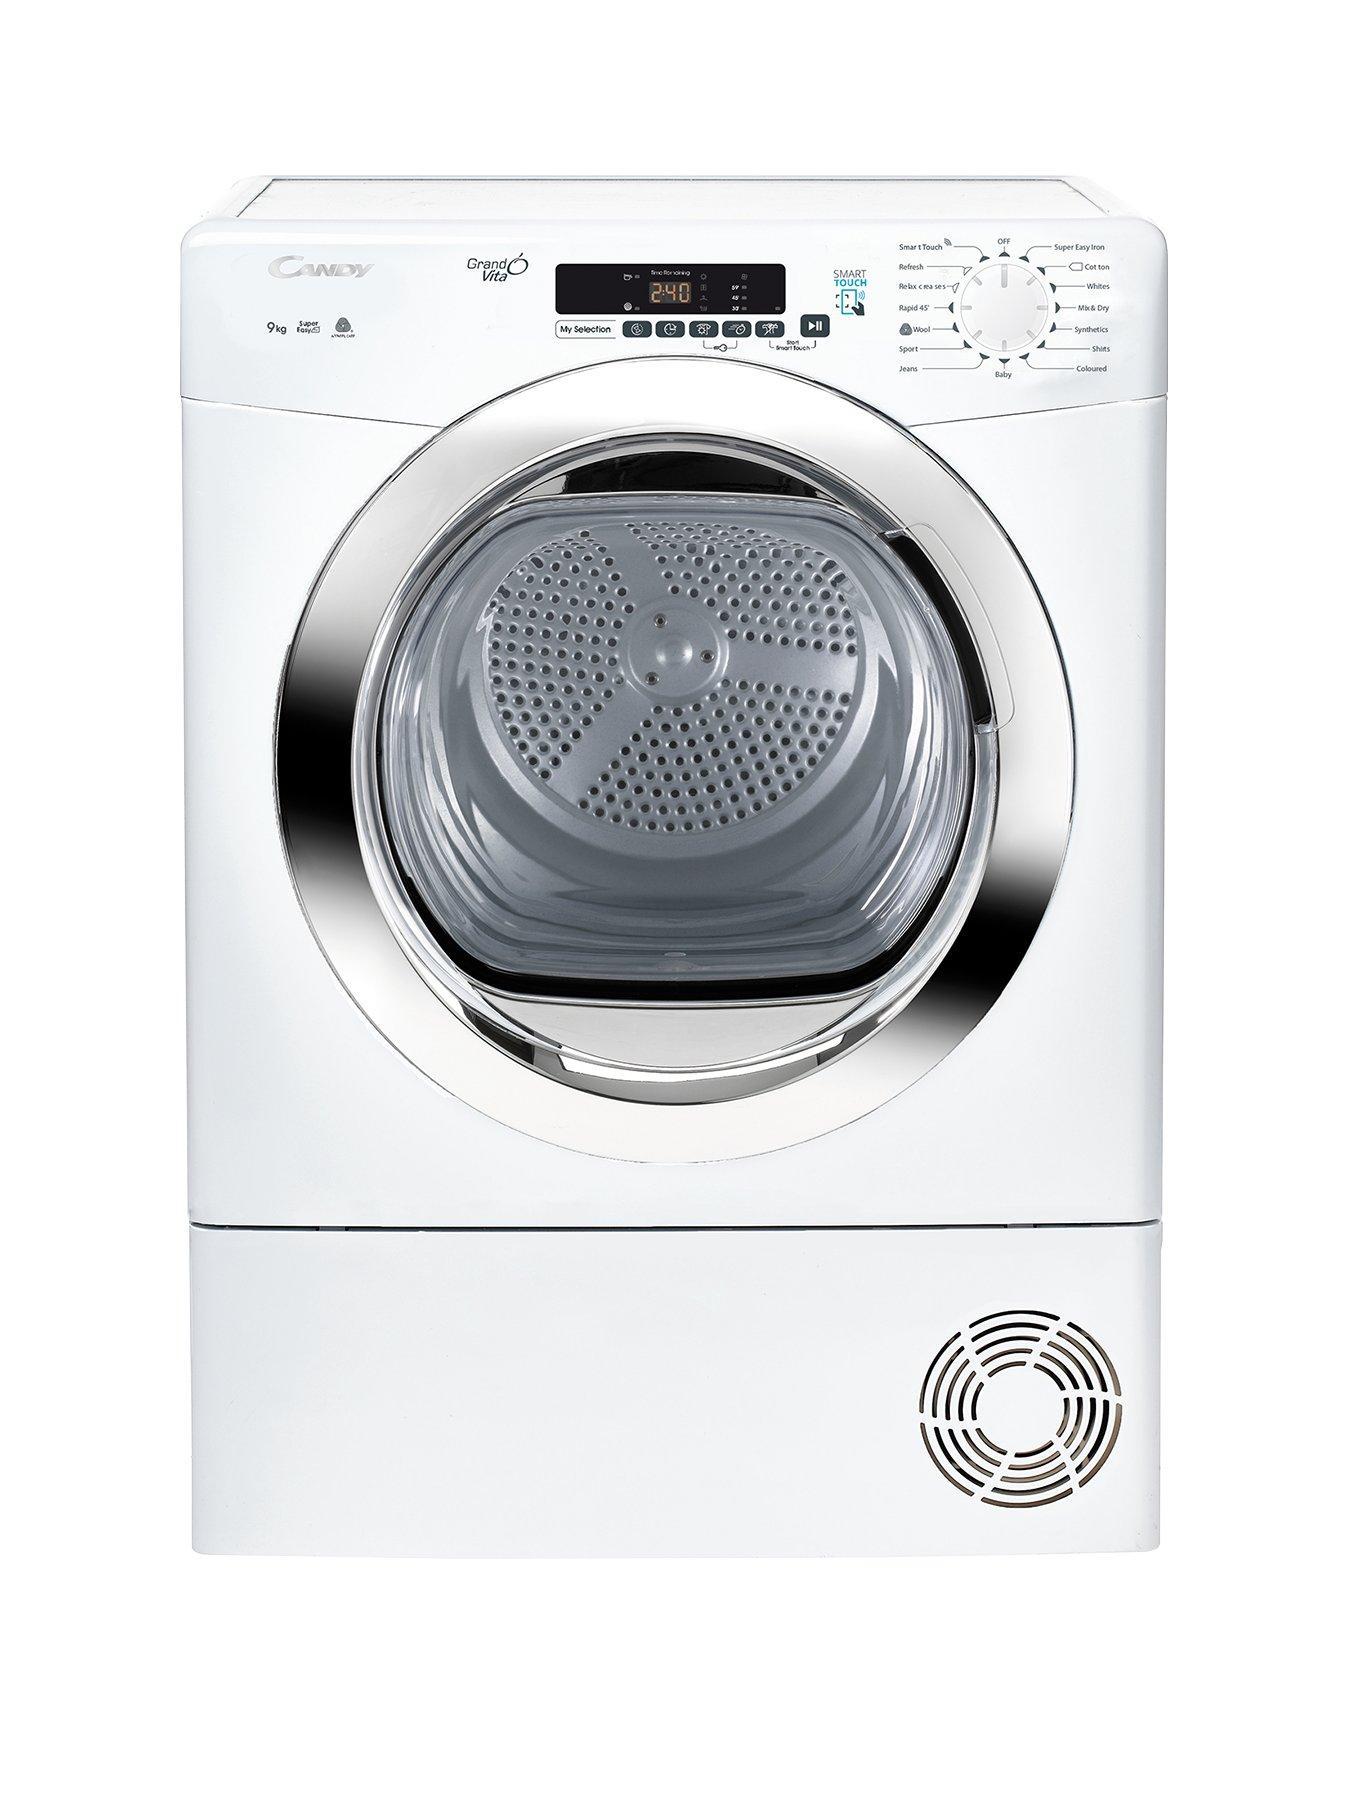 Candy Gvs C9dcg Tumble Dryer Appliance Spotter